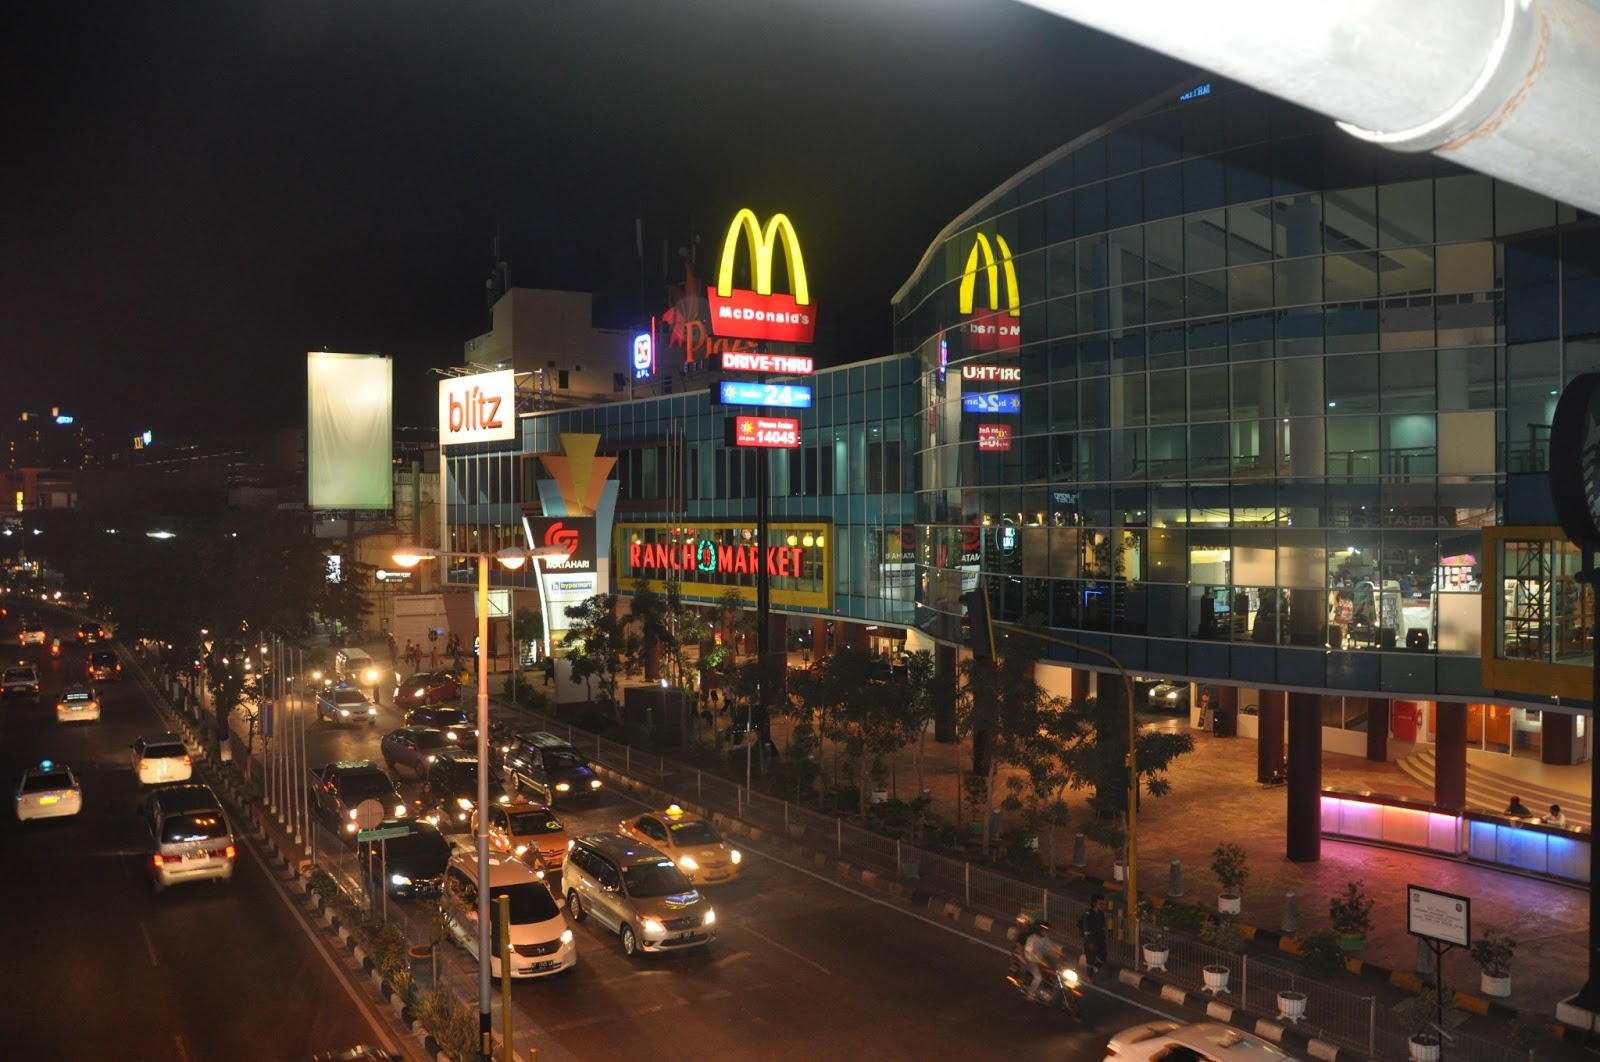 Ramzi S Photography Balikpapan In Snapshoot At Night Moment From